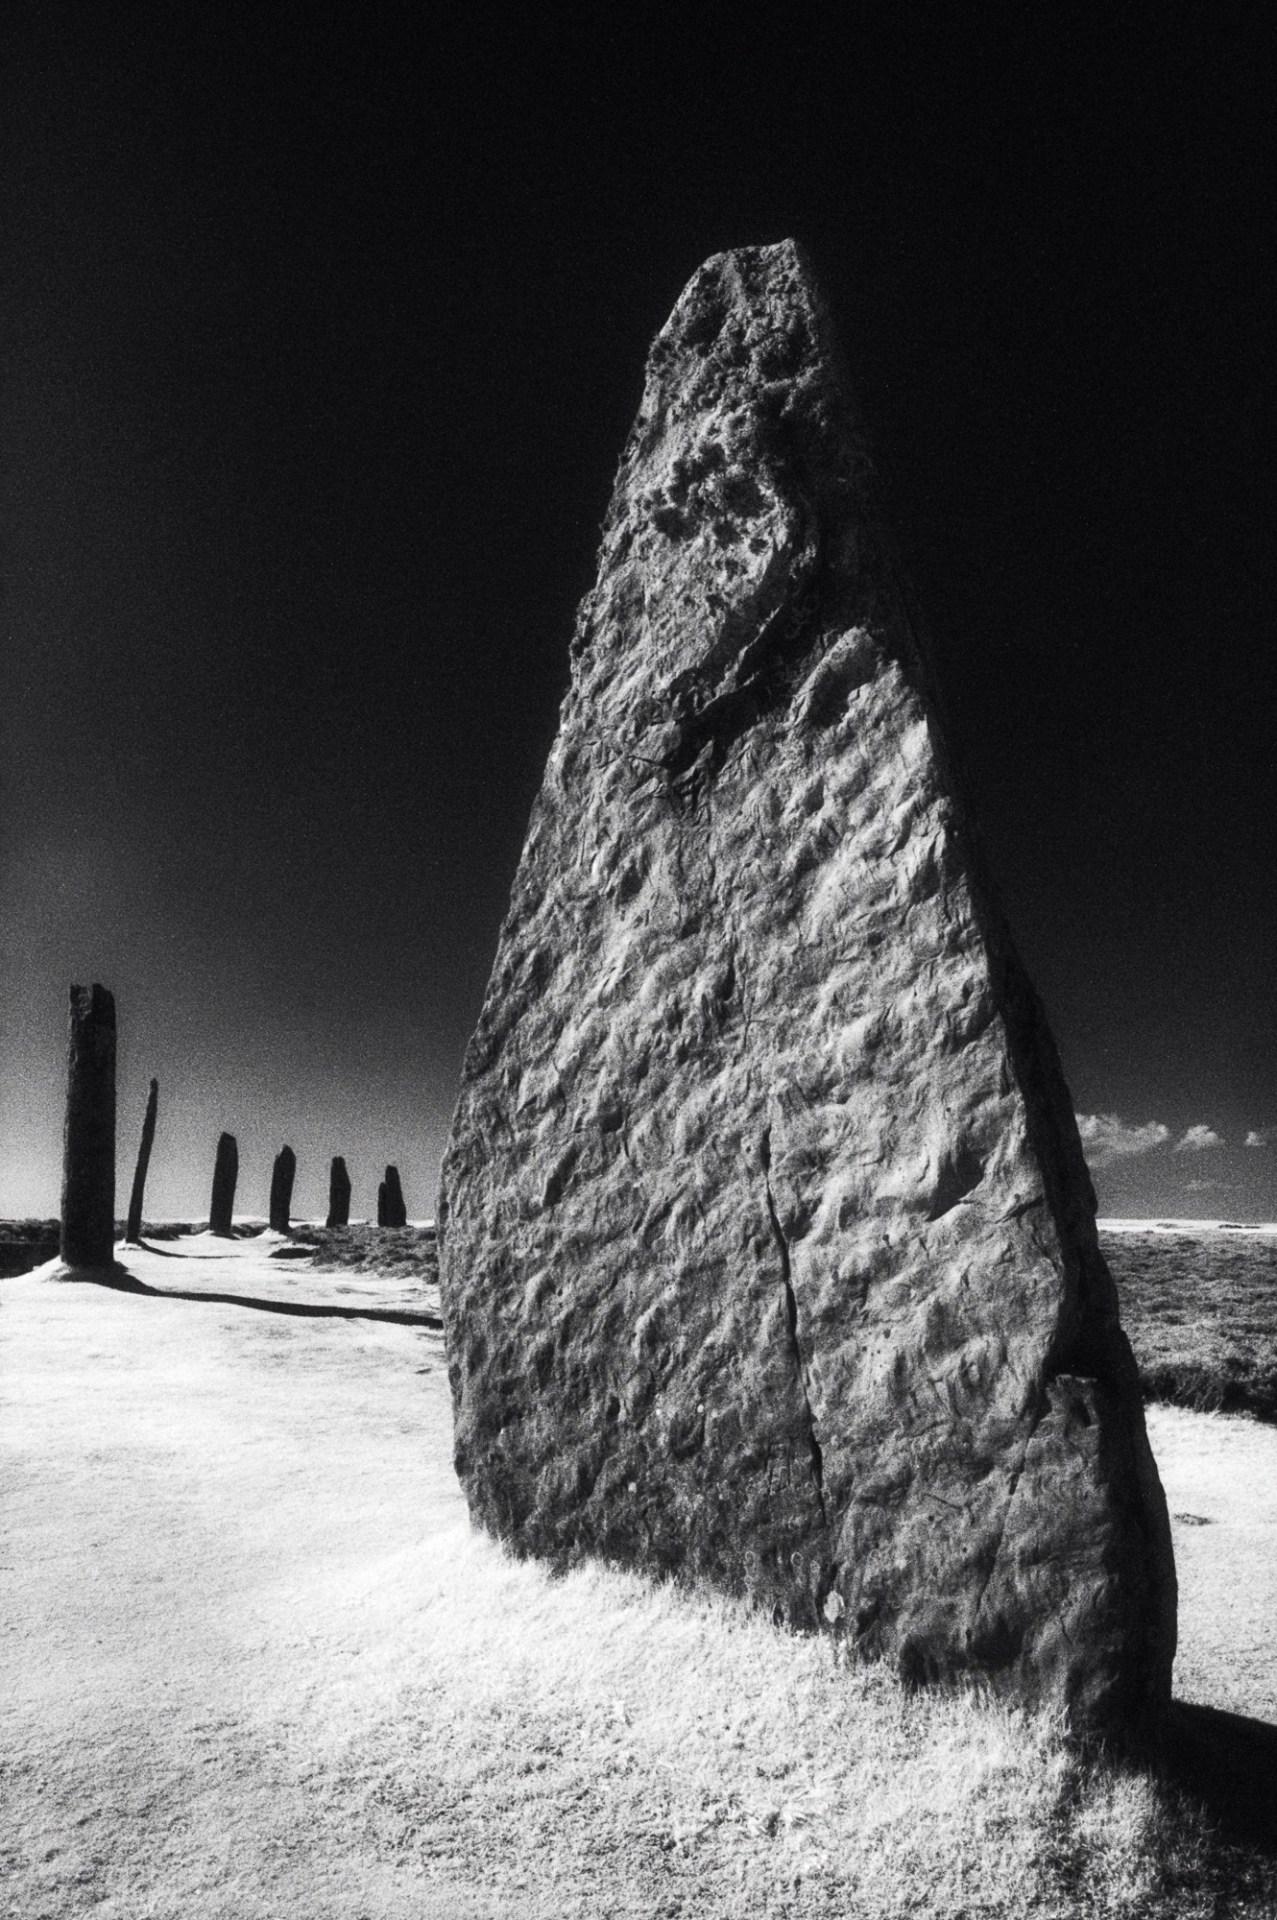 stone_circle_photography-1.jpg